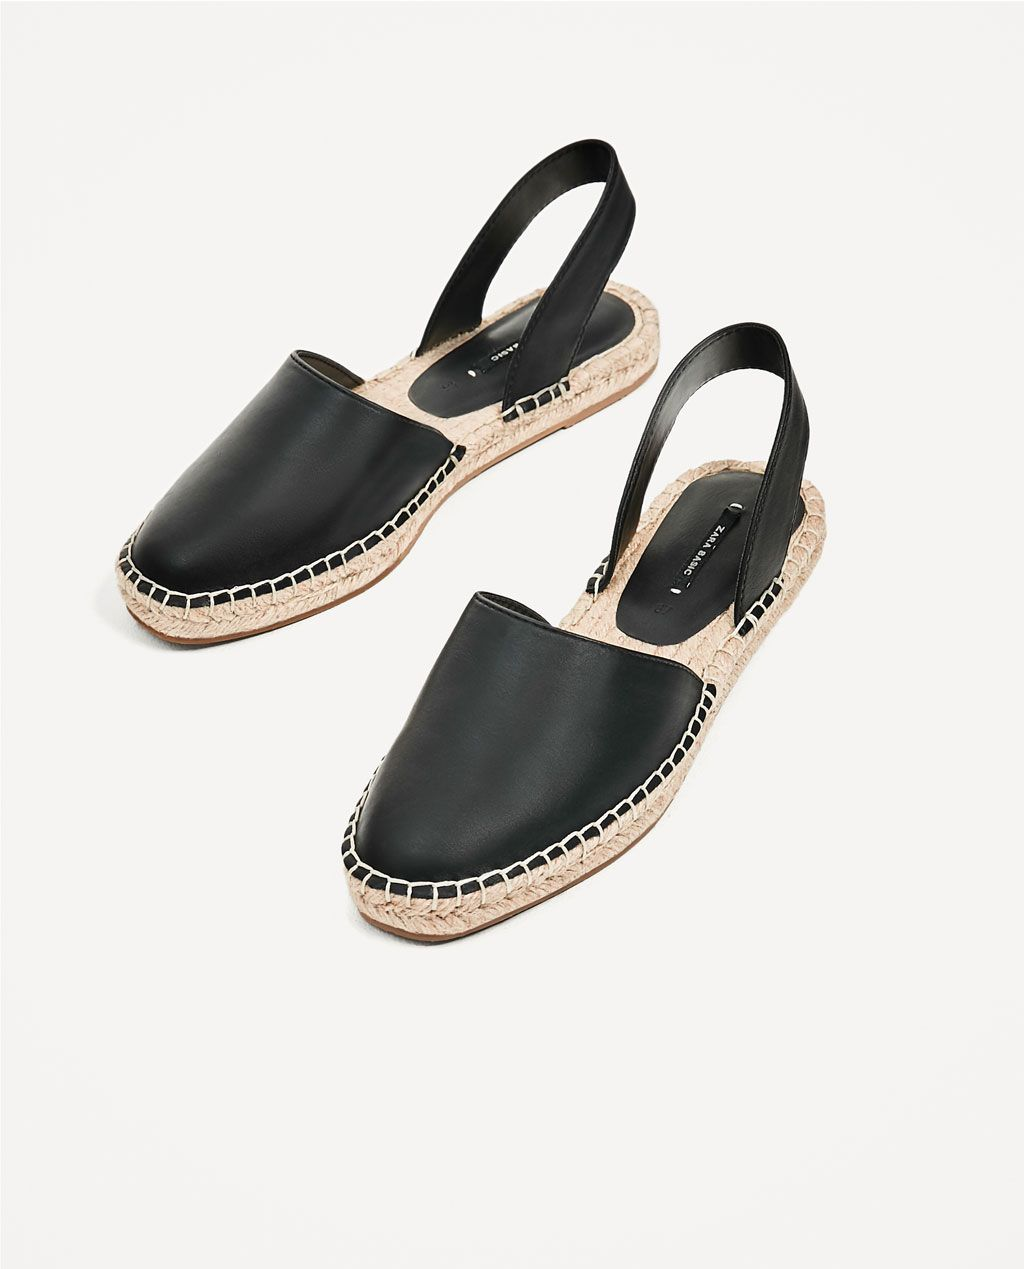 Echt Leder Espadrilles Espandrillos Jute Spain Beach Leather Summer Zapatos Spain Jute 9d2cb3